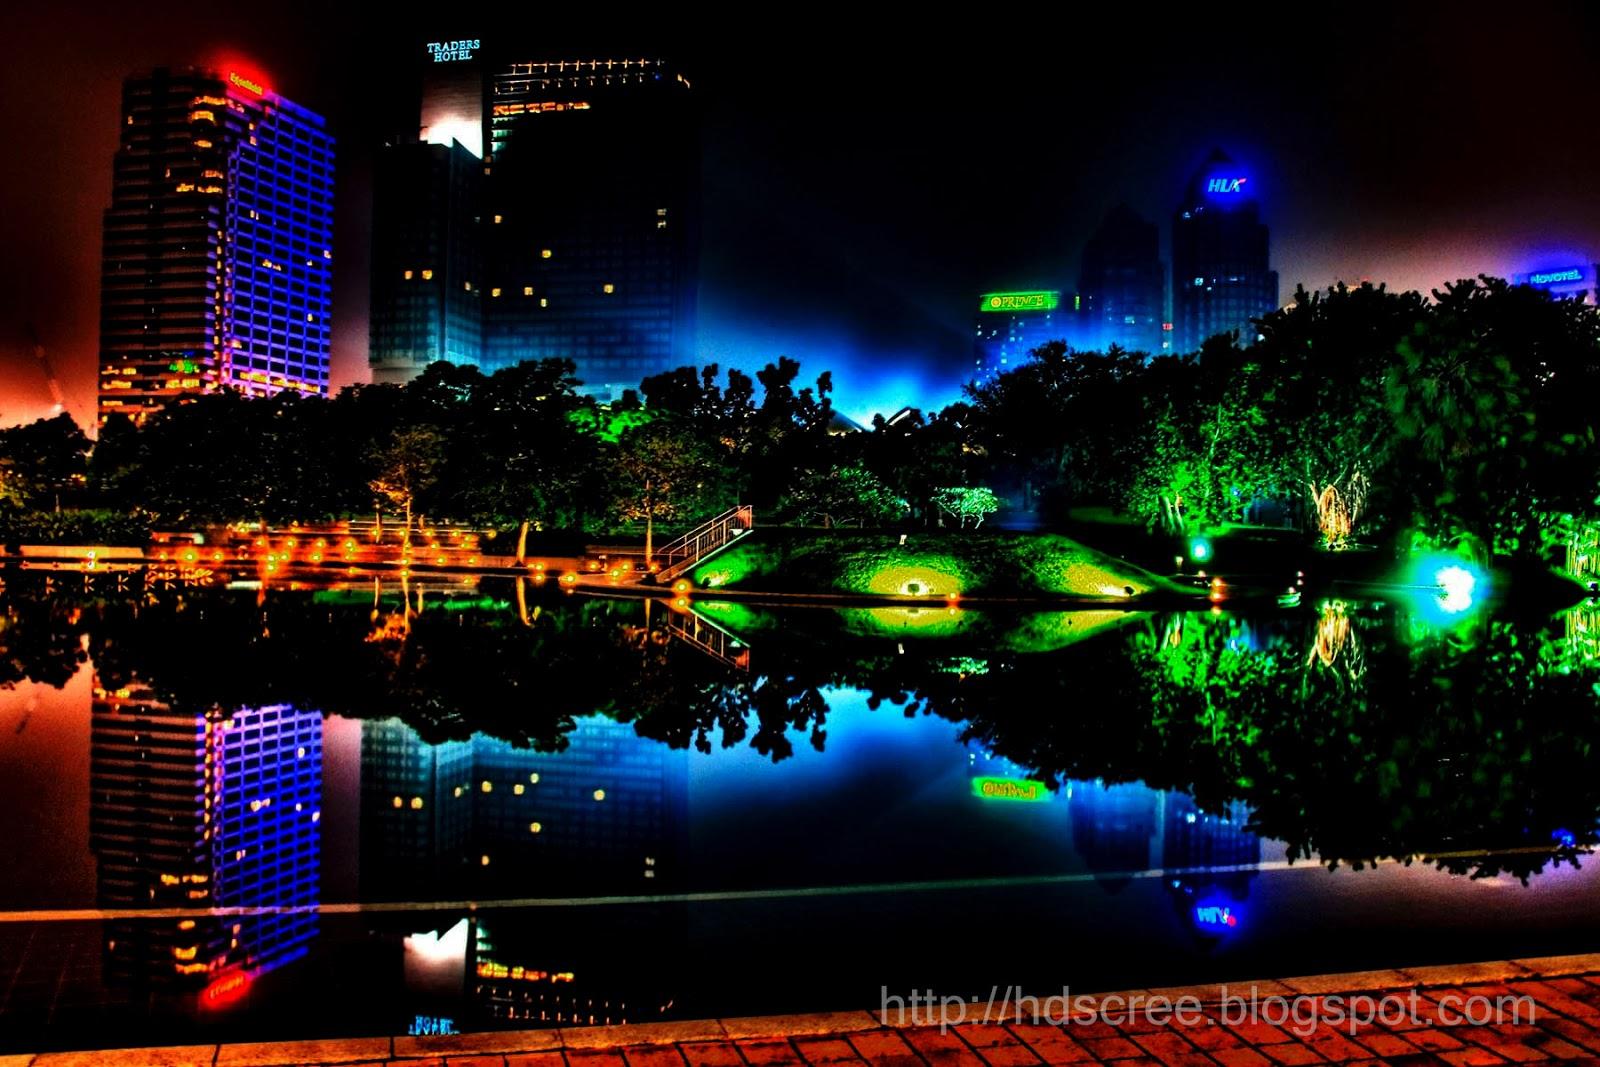 Best Cool HD Background 2014 | HD Wallpaper | HD Screensaver | HD Background